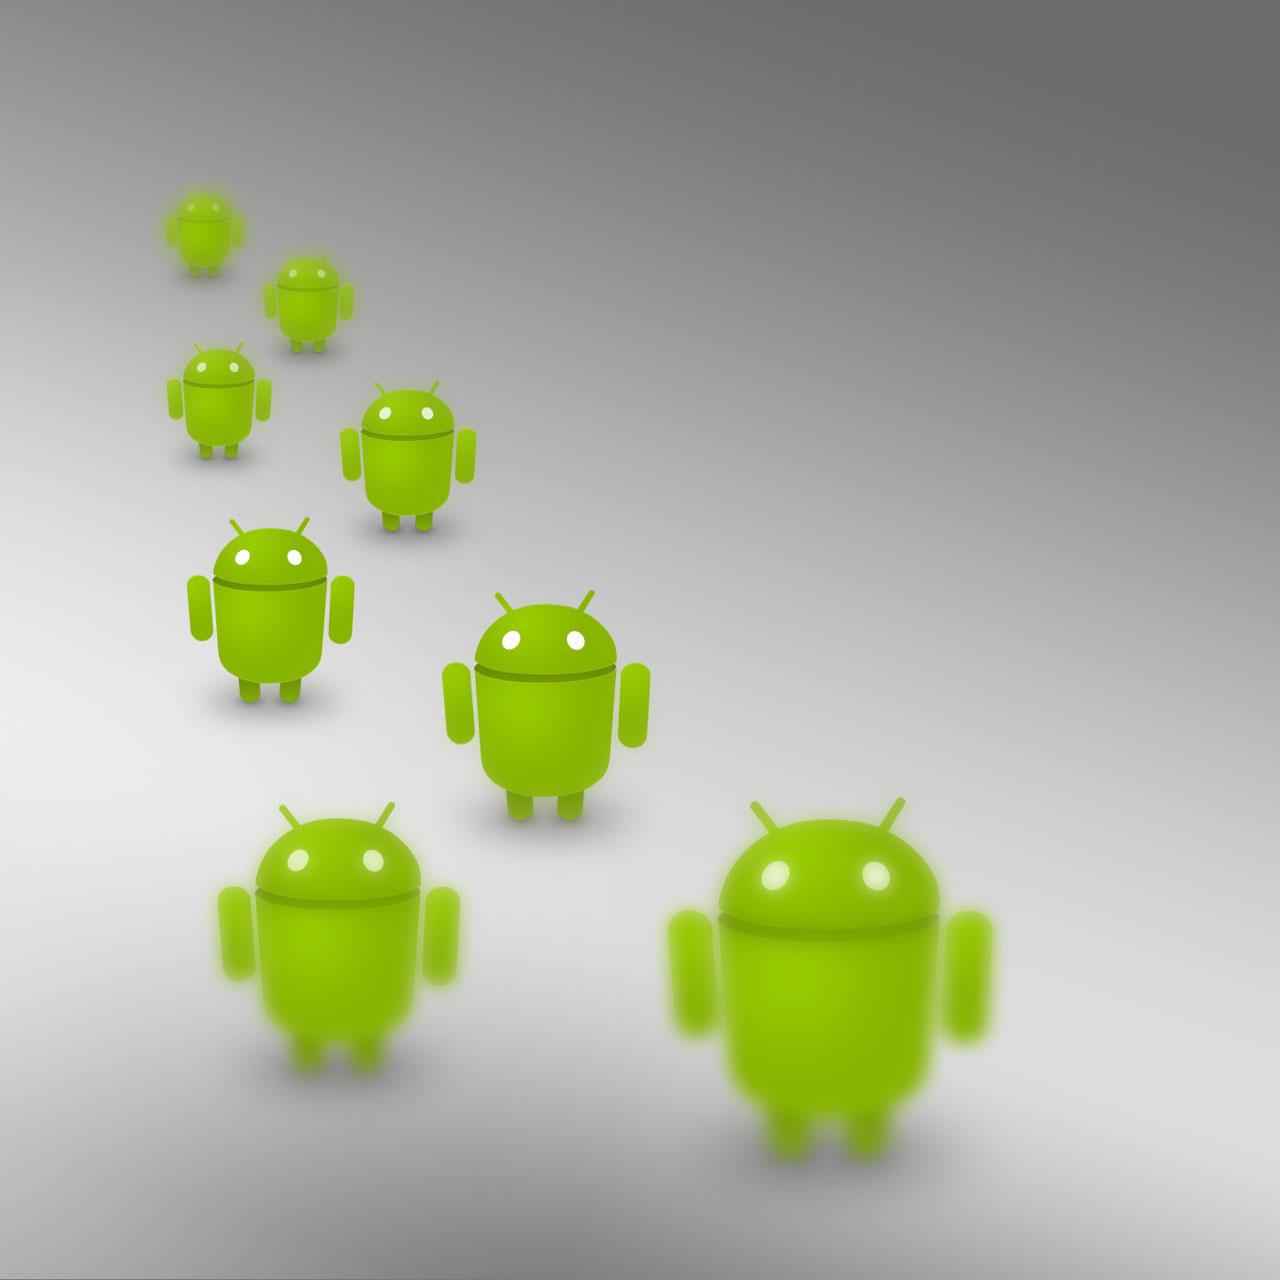 Samsung Galaxy Tab 101 Android bots wallpapers Samsung Galaxy Tab 1280x1280